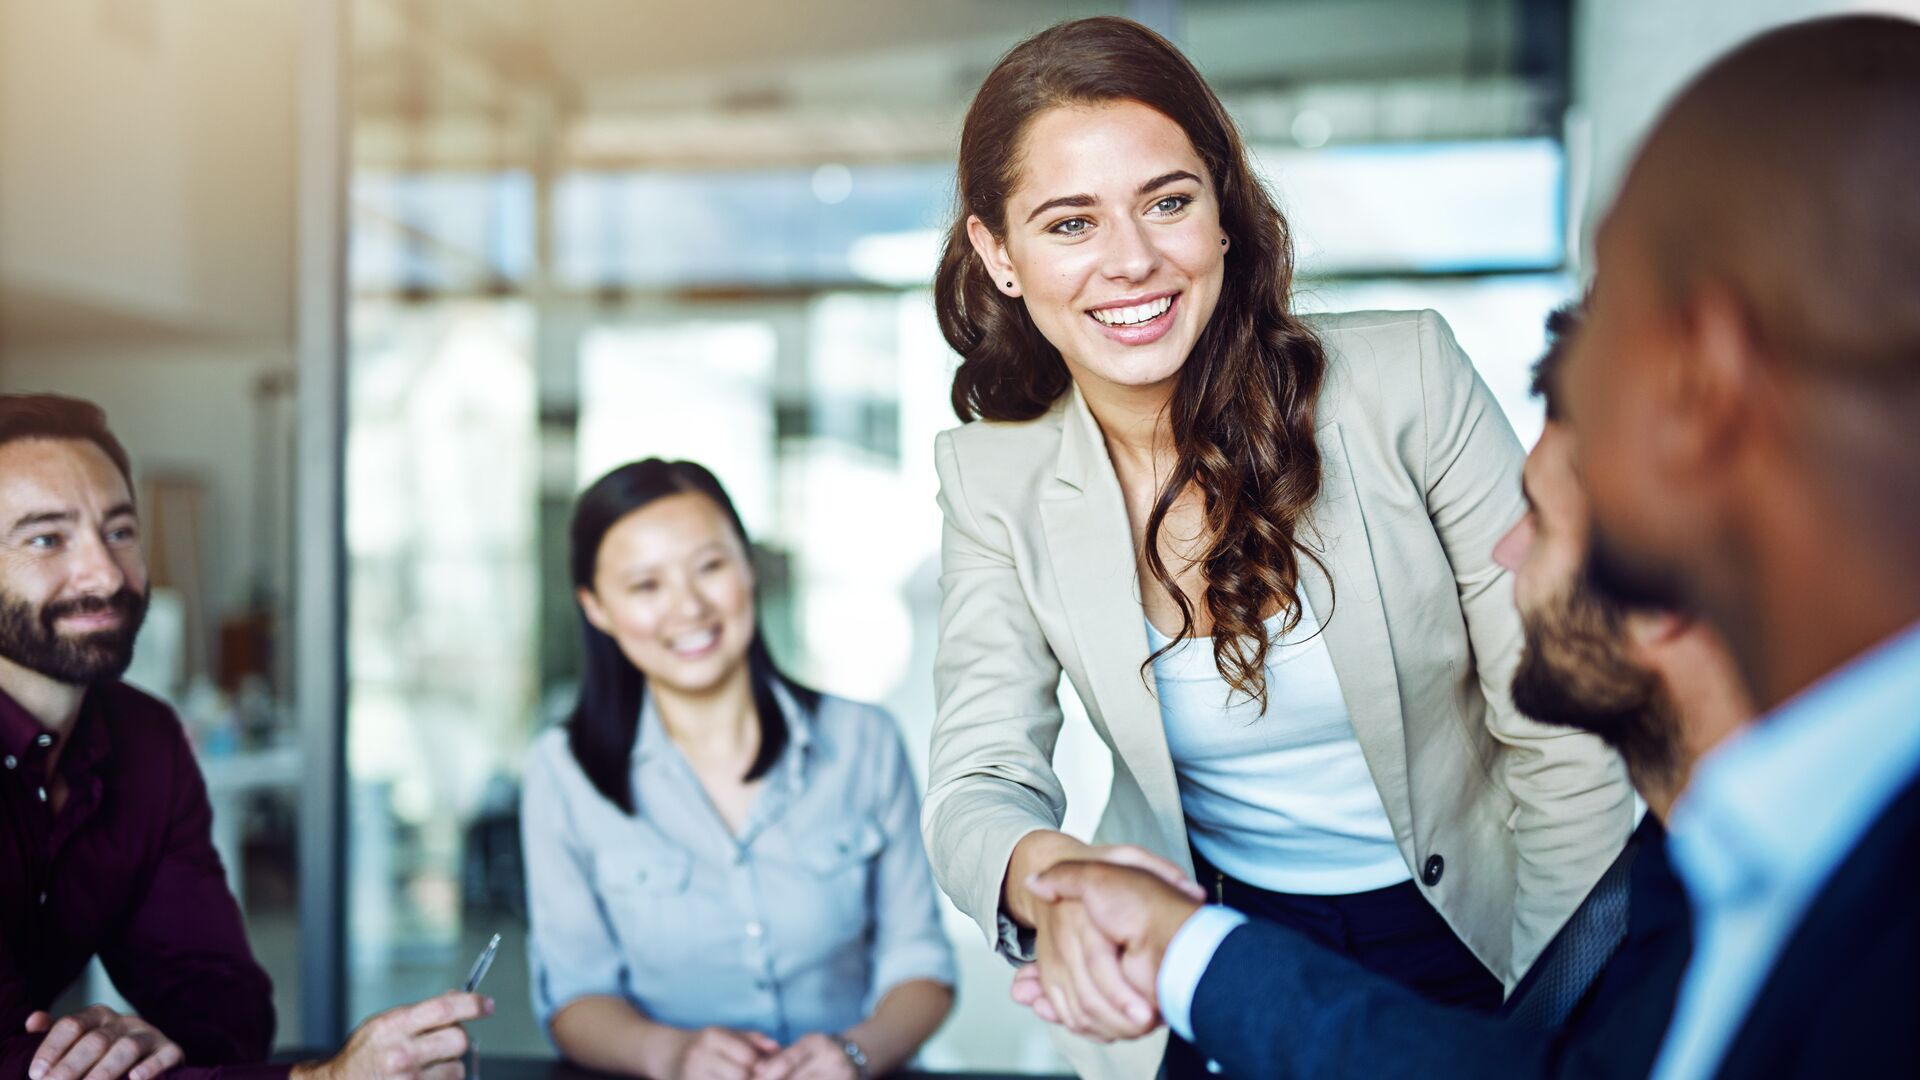 Boa Lingua, Sprachaufenthalt - Karriere & Studium